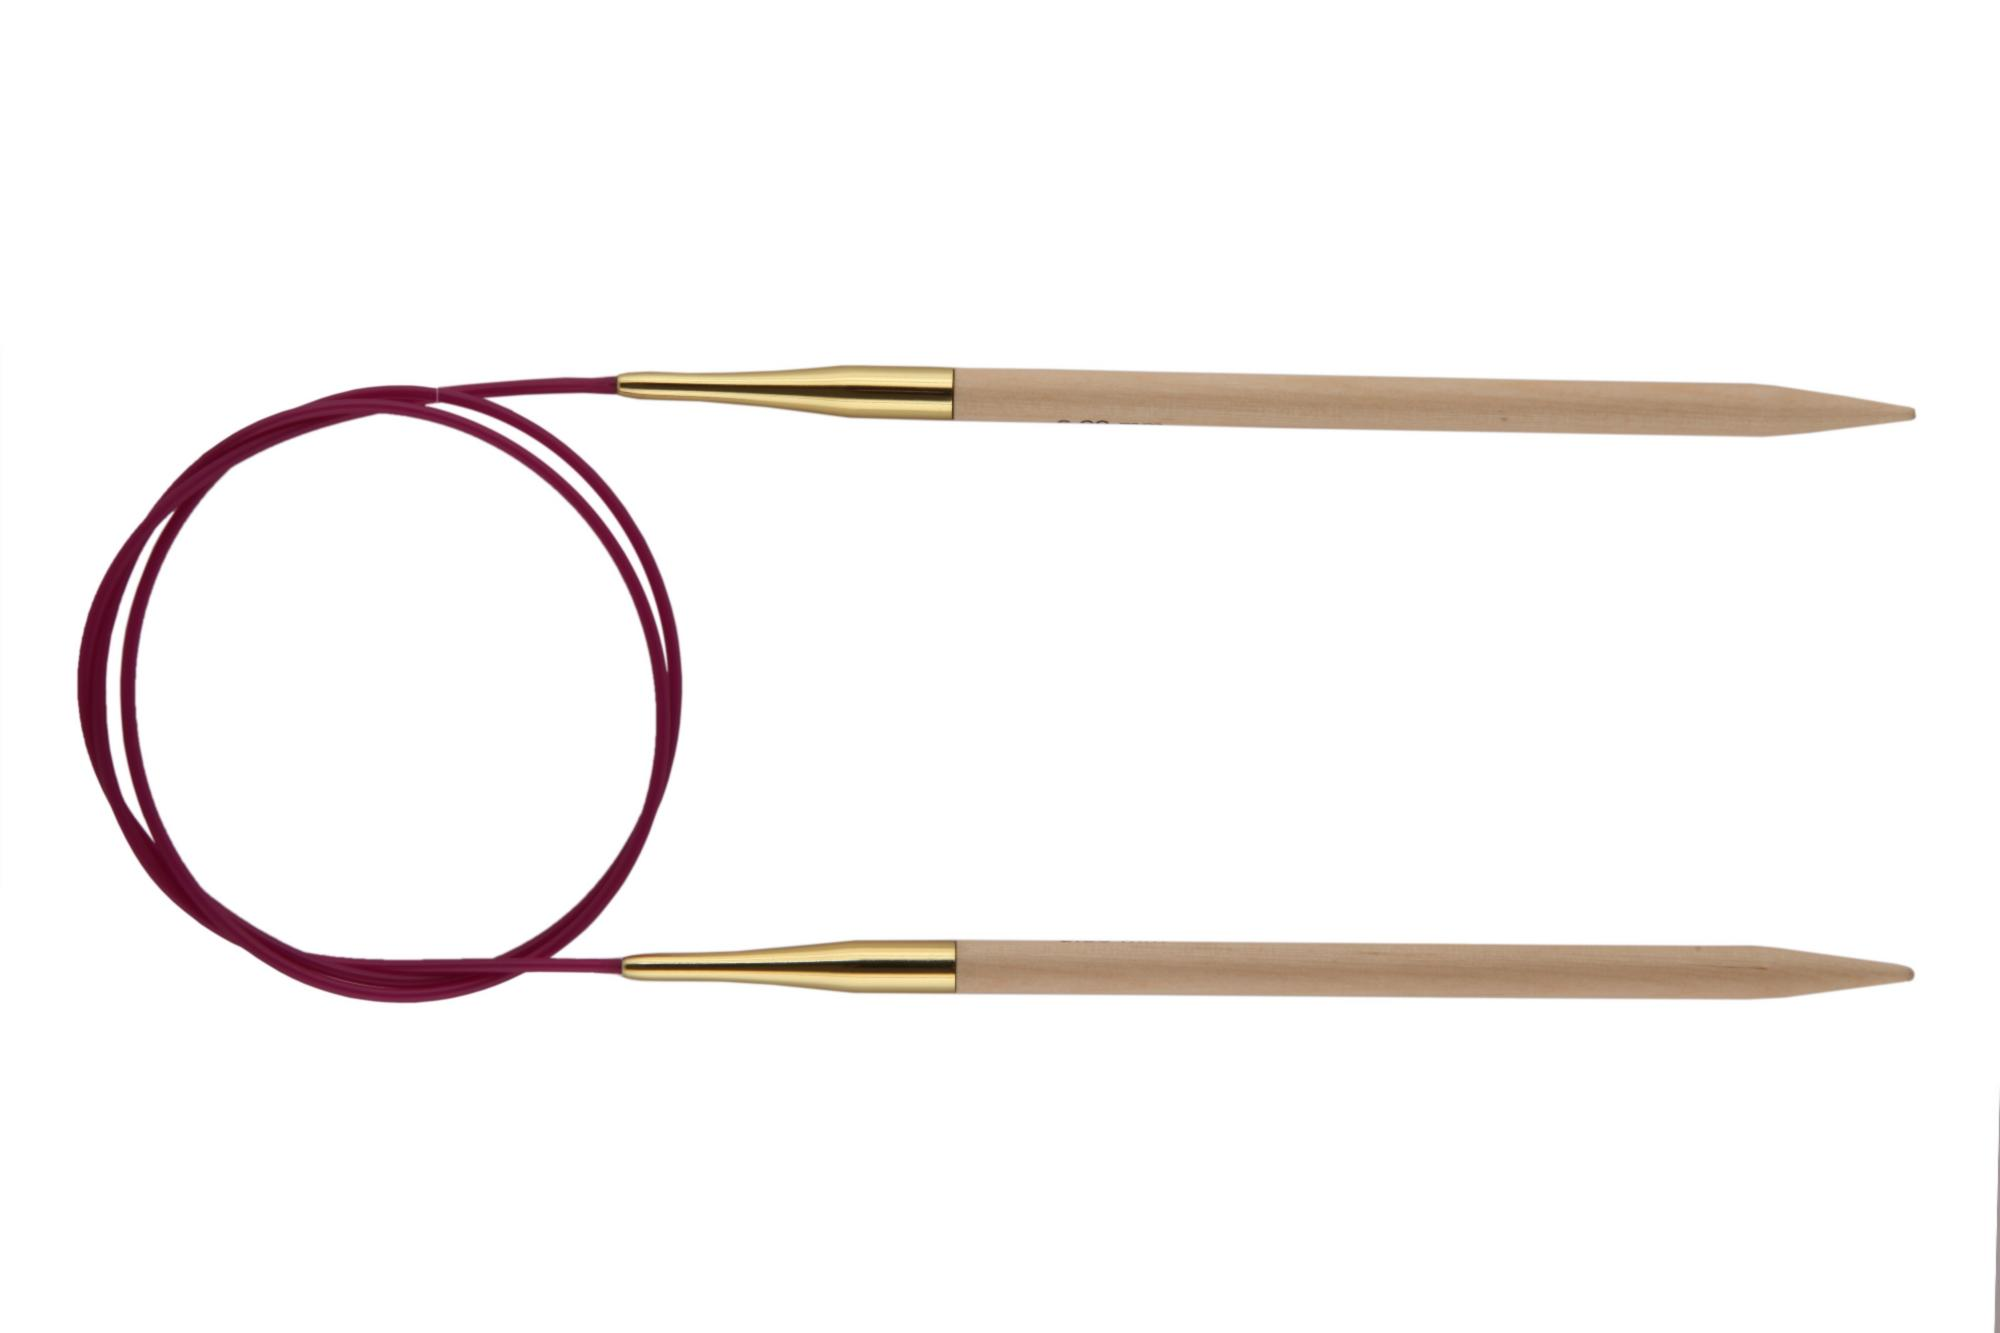 Спицы круговые 120 см Basix Birch Wood KnitPro, 35403, 3.75 мм